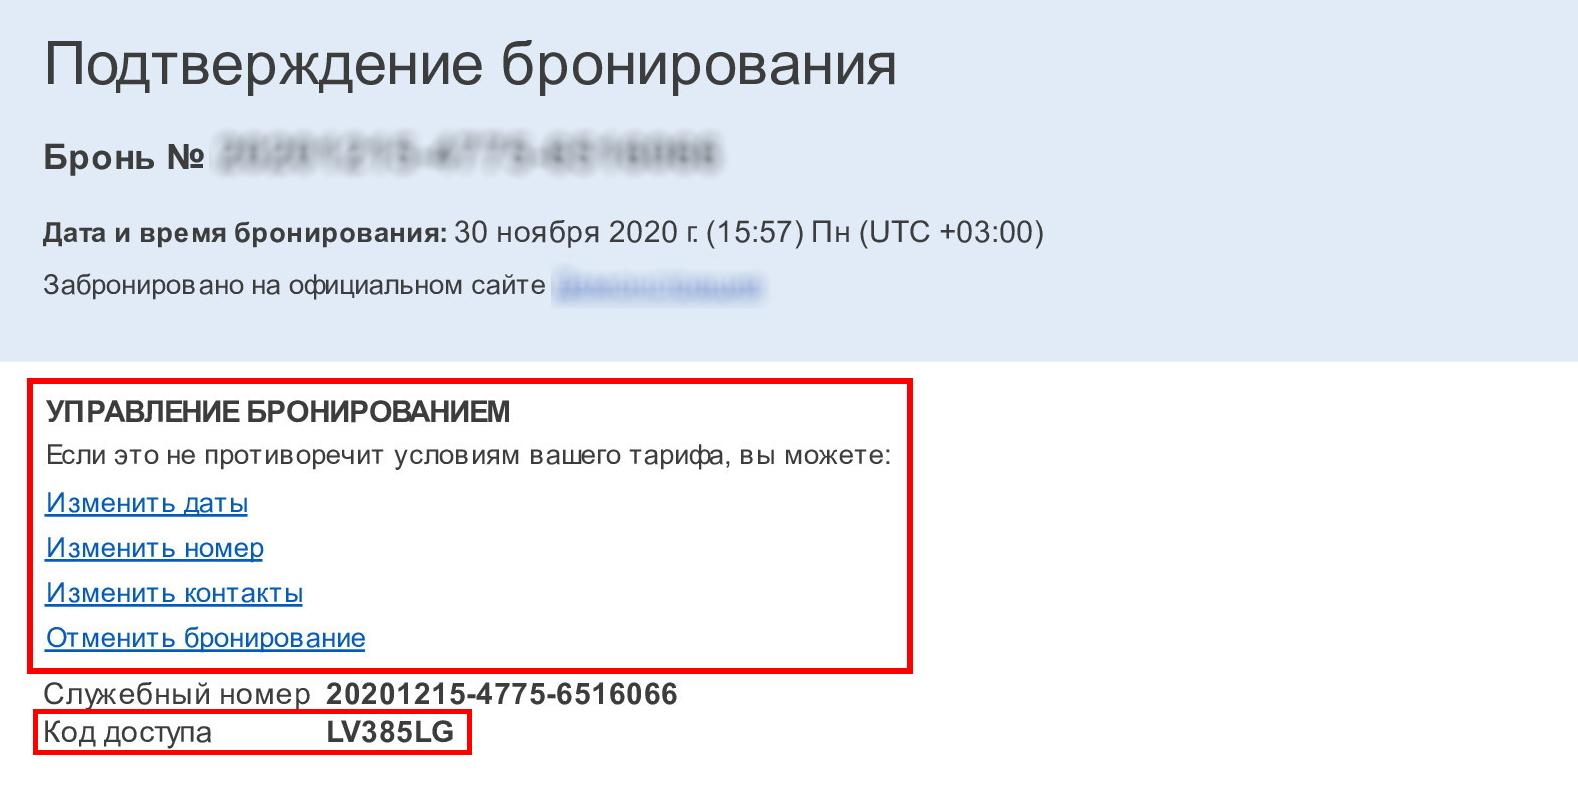 U3CL-B1H_0Pgpc2EYkO2NzoUufDHg--qsySE_bXG